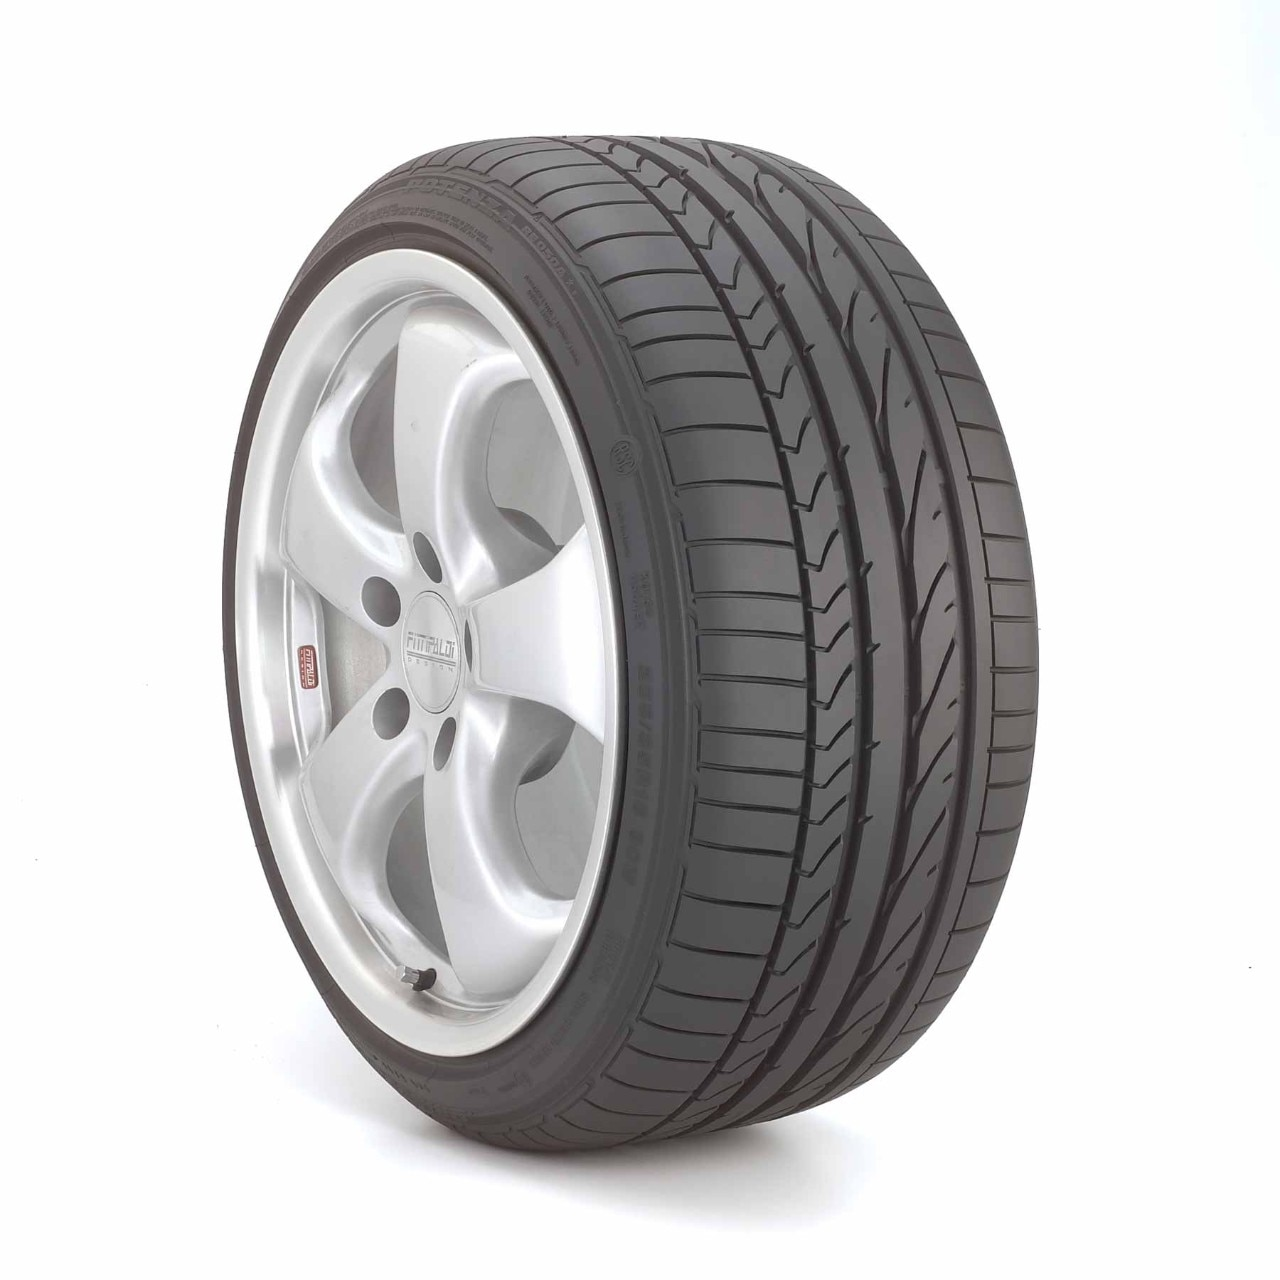 Bridgestone Potenza Re050A >> Potenza RE050A | Sports Car Tires with Impressive Handling